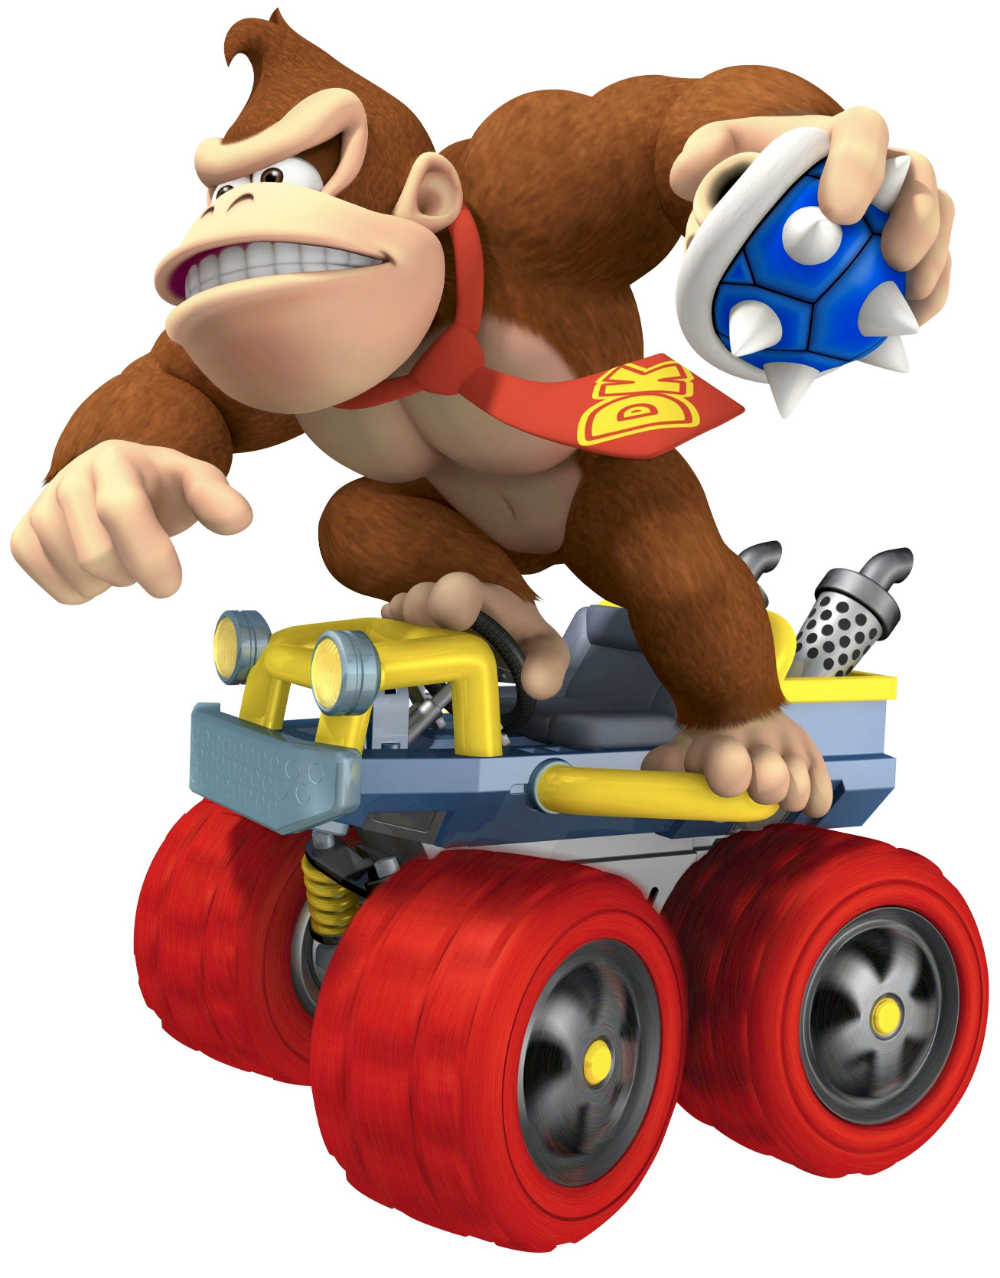 Donkey Kong Mario Kart Mario Kart 7 Donkey Kong